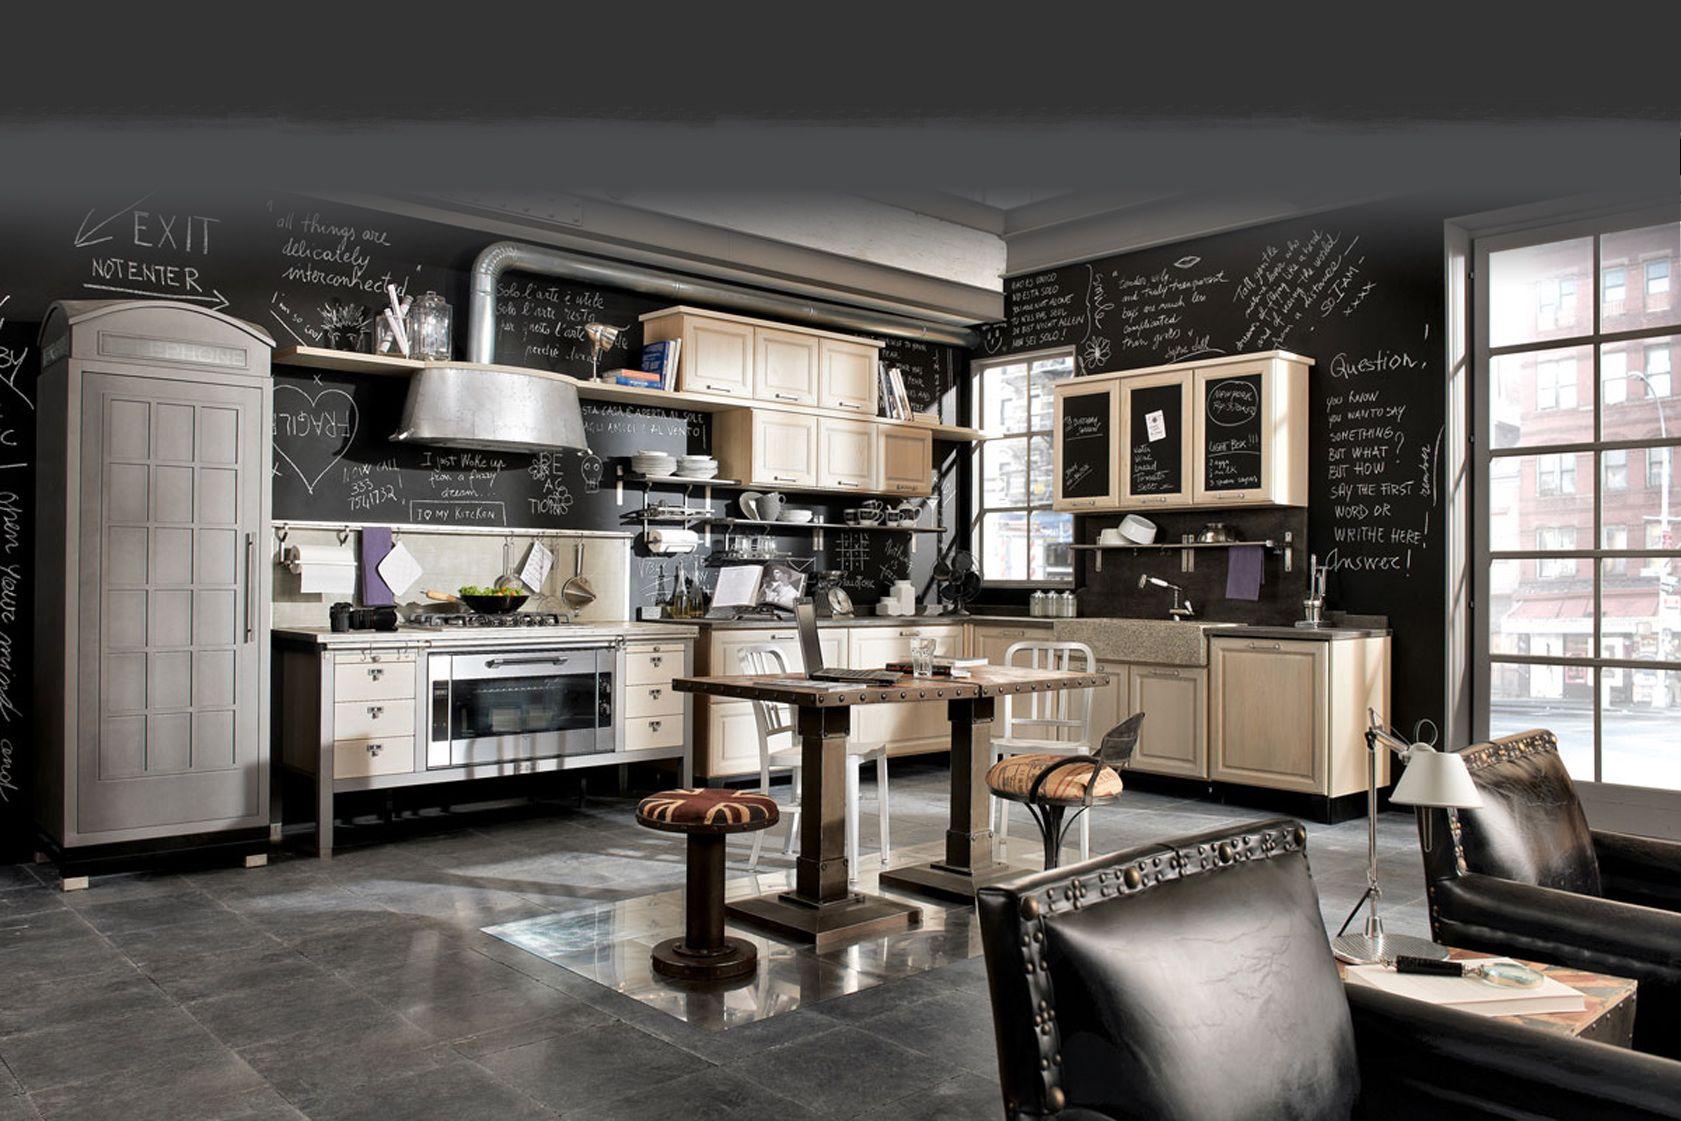 Cucine In Stile Country Dal Tocco Industrial Della Linea Vintage